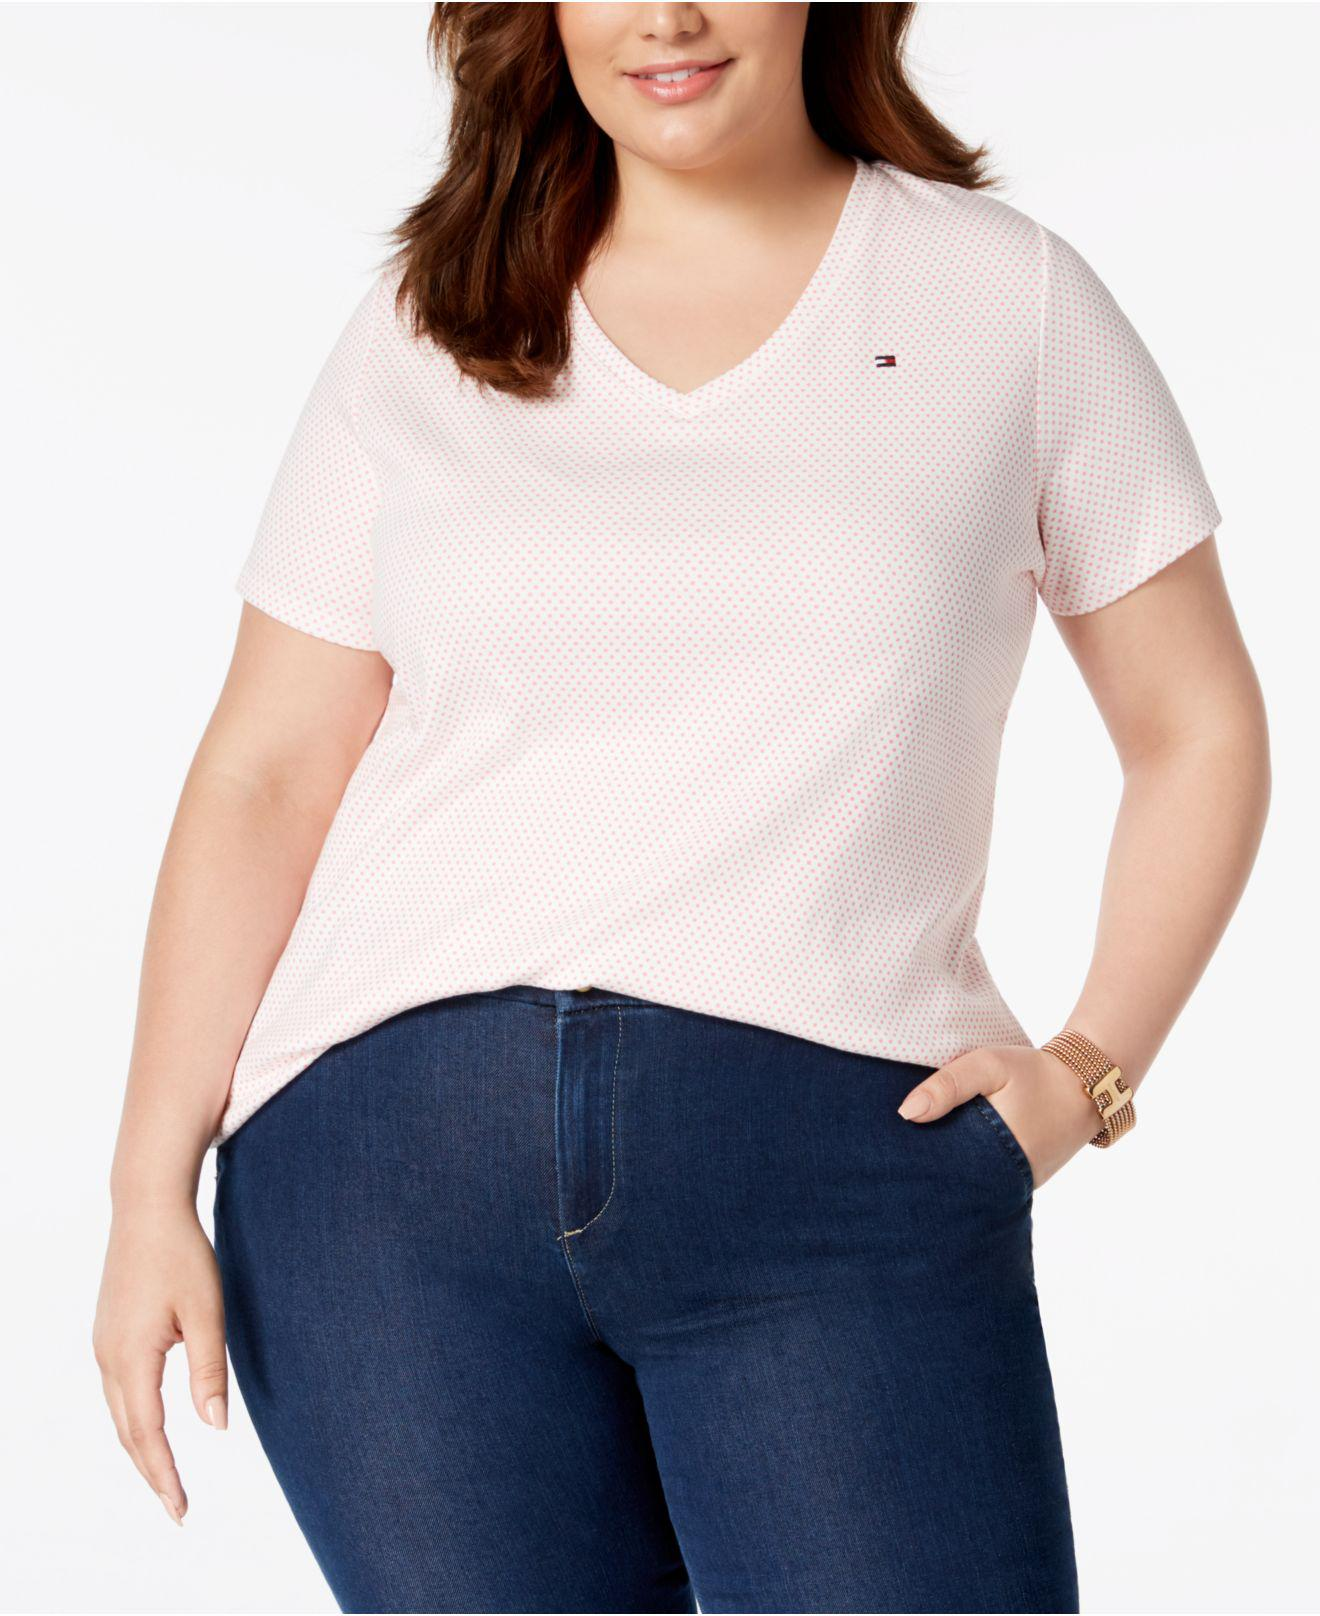 40c25ba43 Lyst - Tommy Hilfiger Plus Size Polka Dot Cotton V-neck T-shirt ...